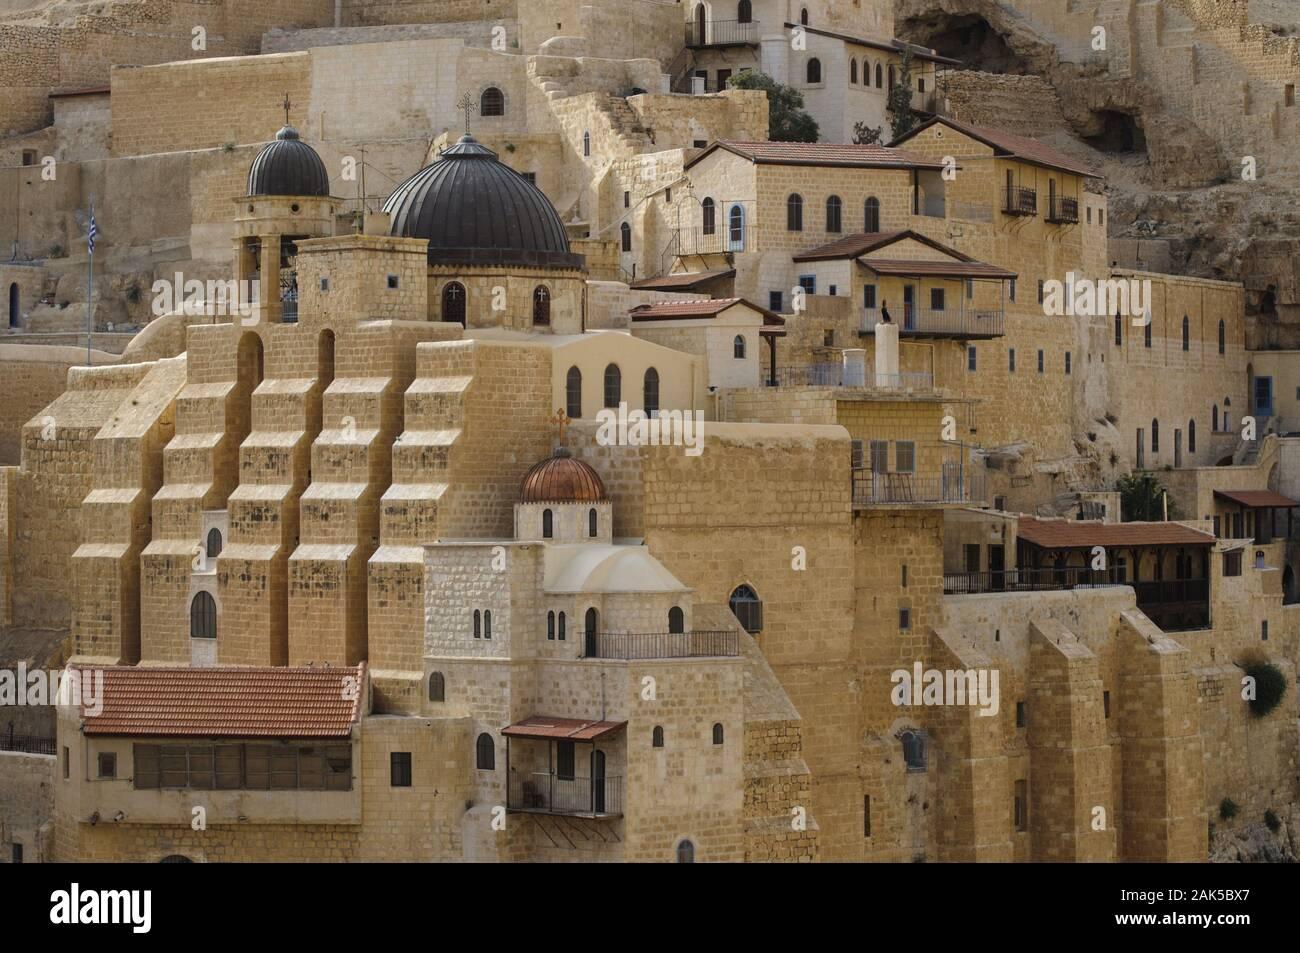 Kidron-Tal: griechisch-orthodoxes Kloster Mar Saba, Israel | usage worldwide Stock Photo